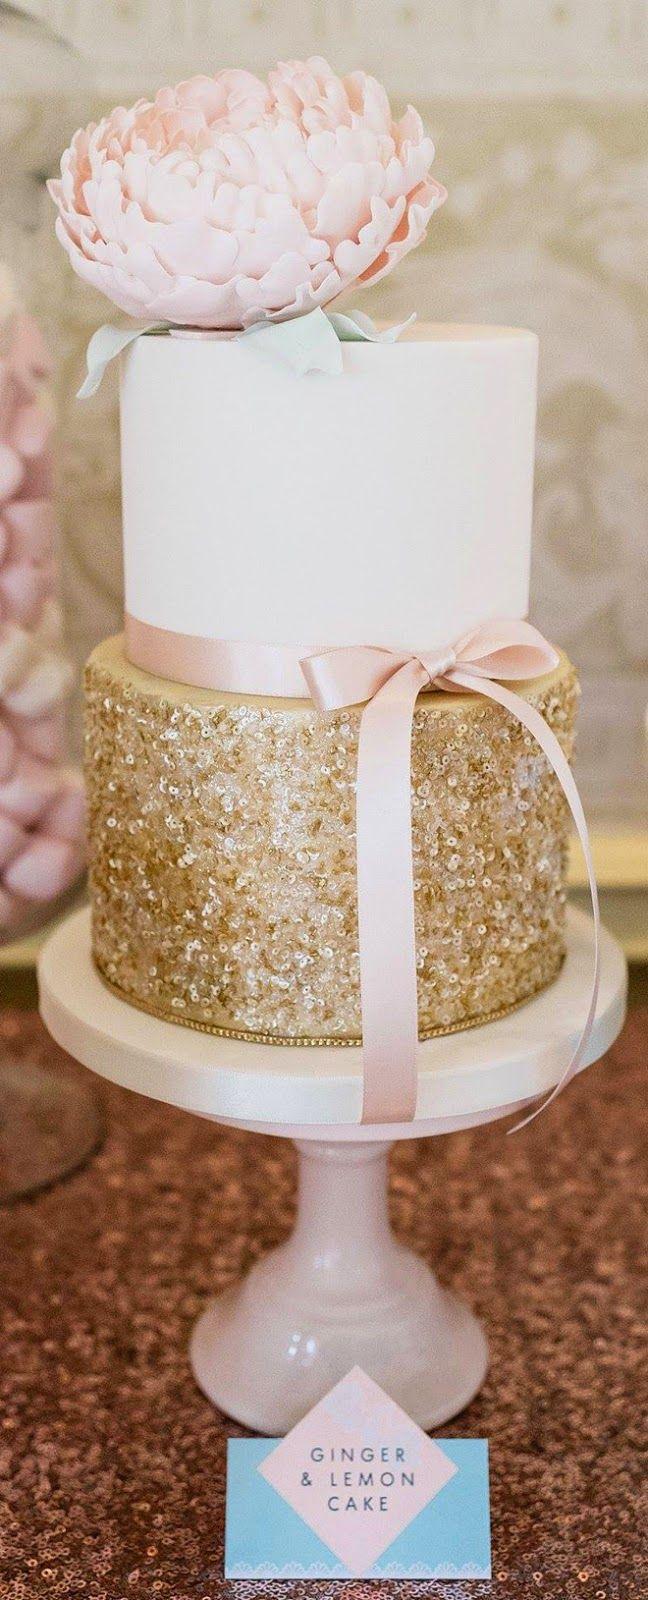 Wedding Trends : Metallic Cakes http://FashionCognoscente.blogspot.com